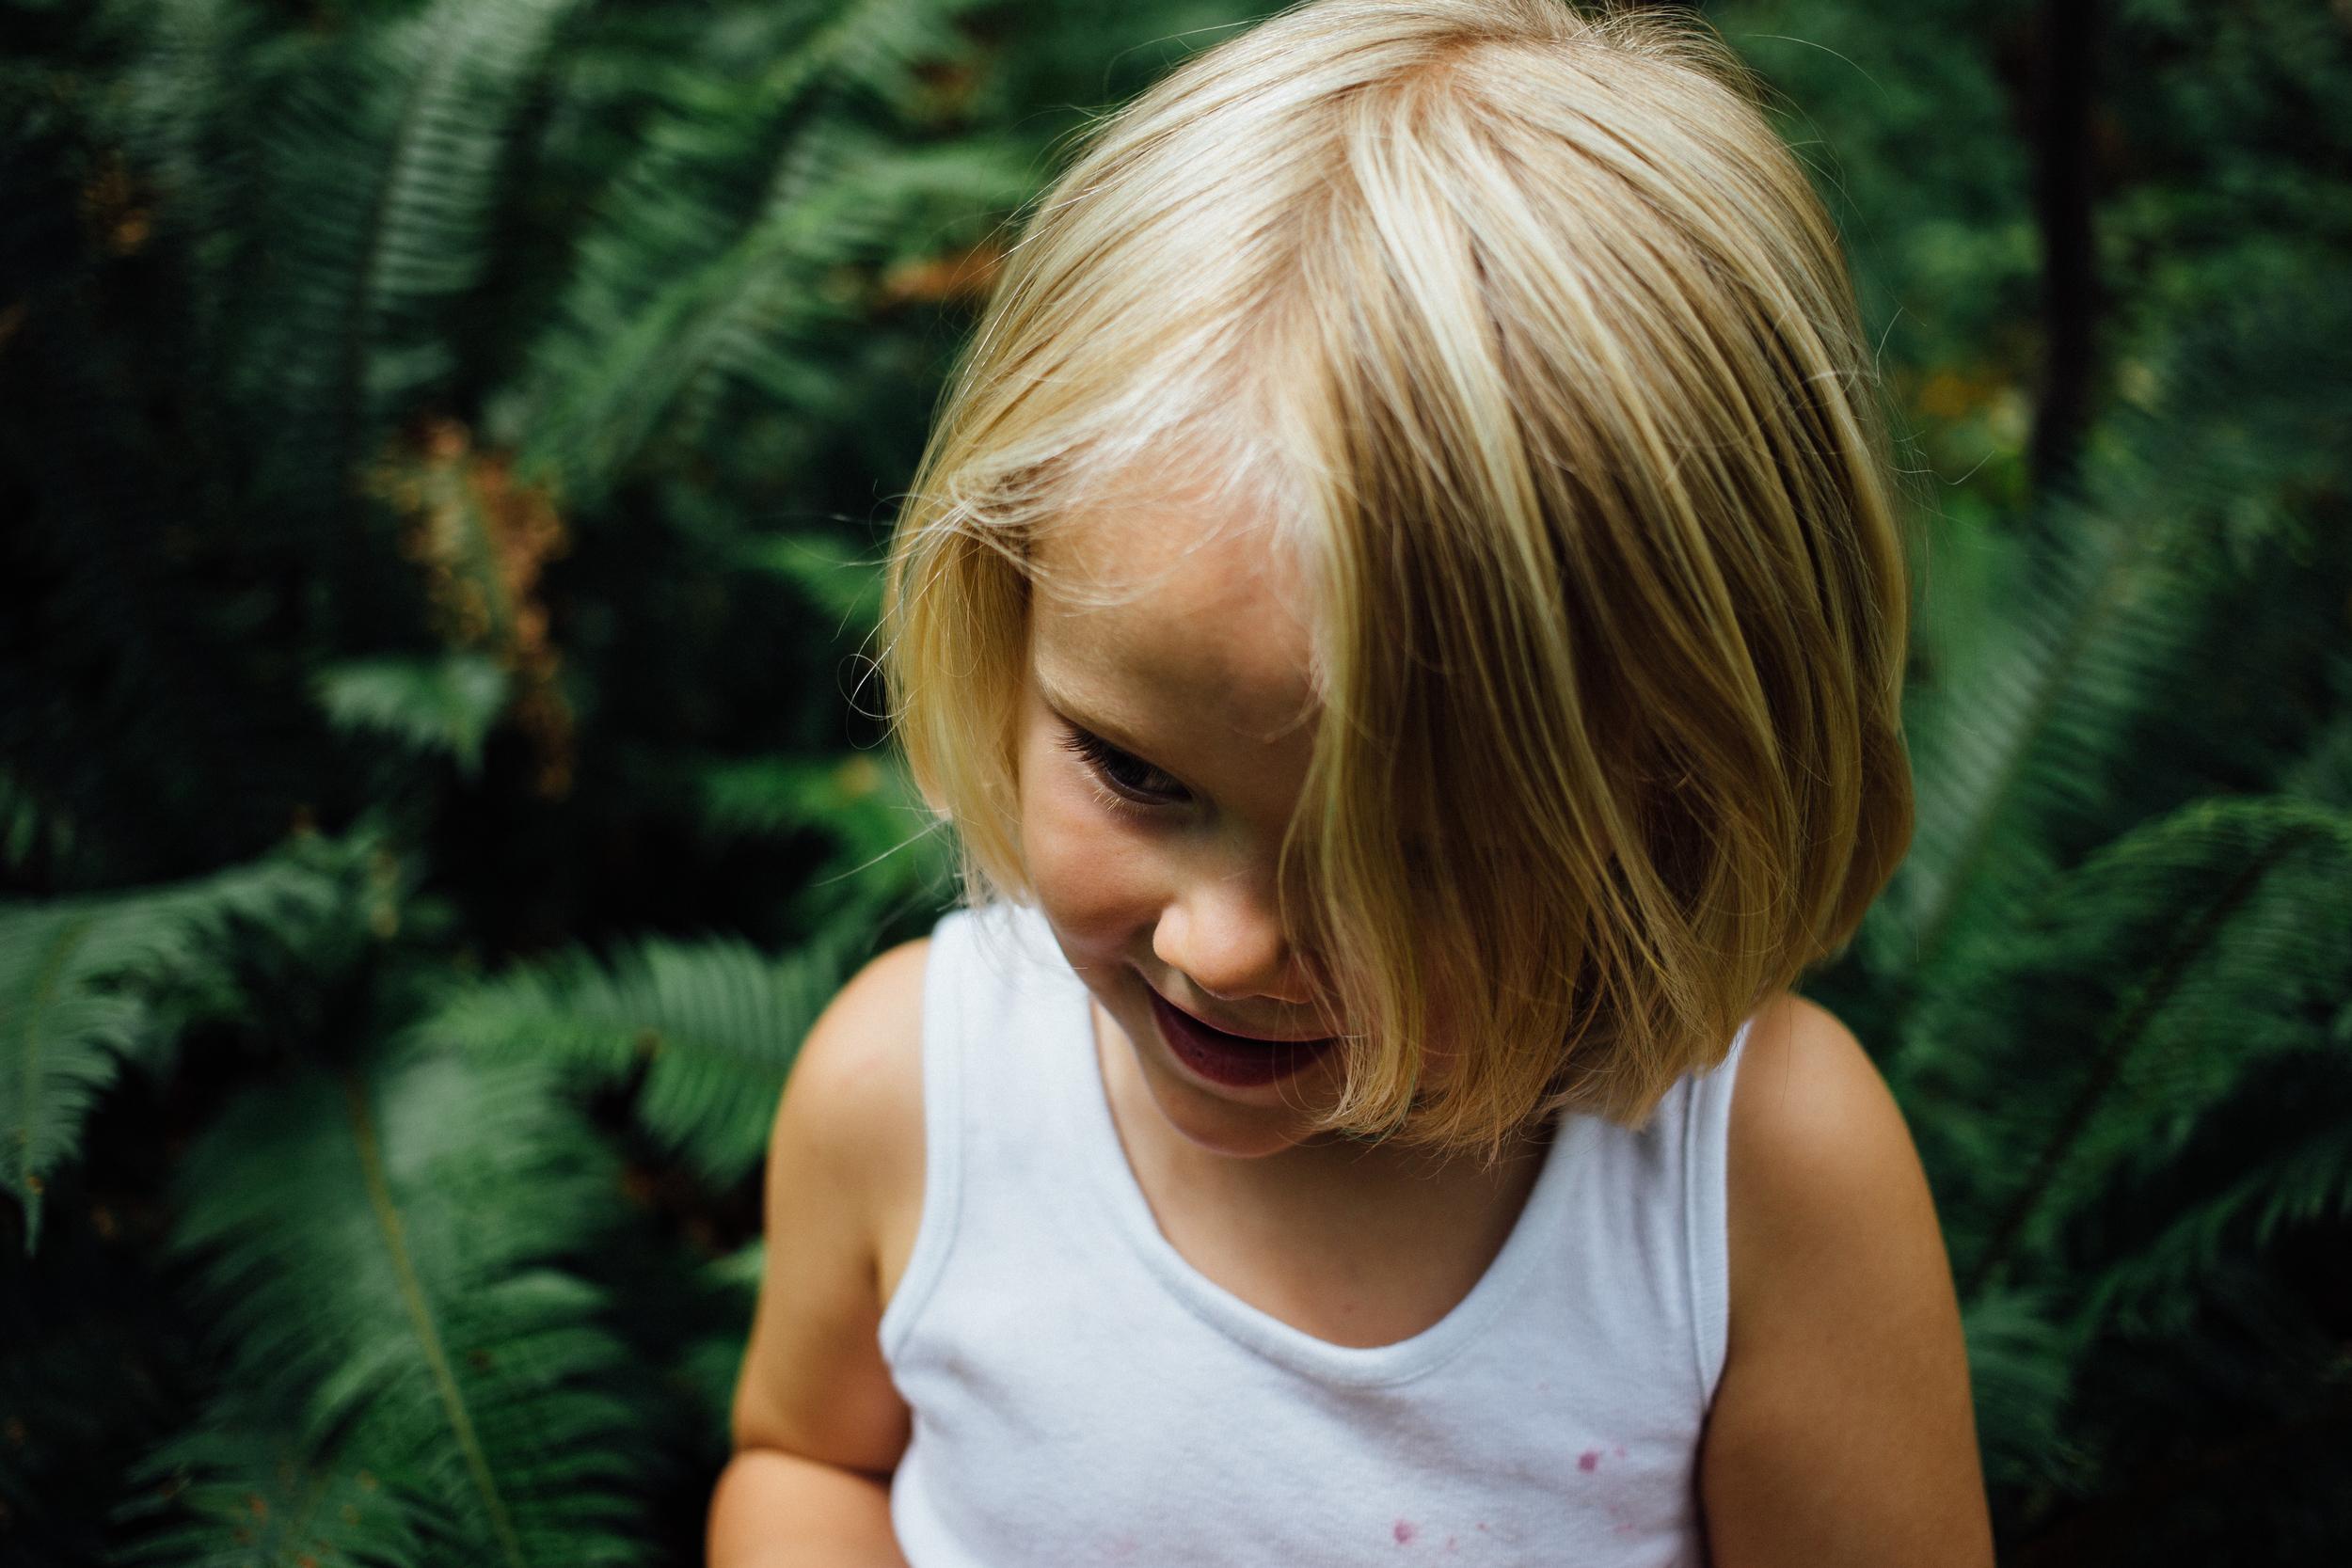 dogwoodphotography_photographer_vancouver_child_roosbday-17.jpg